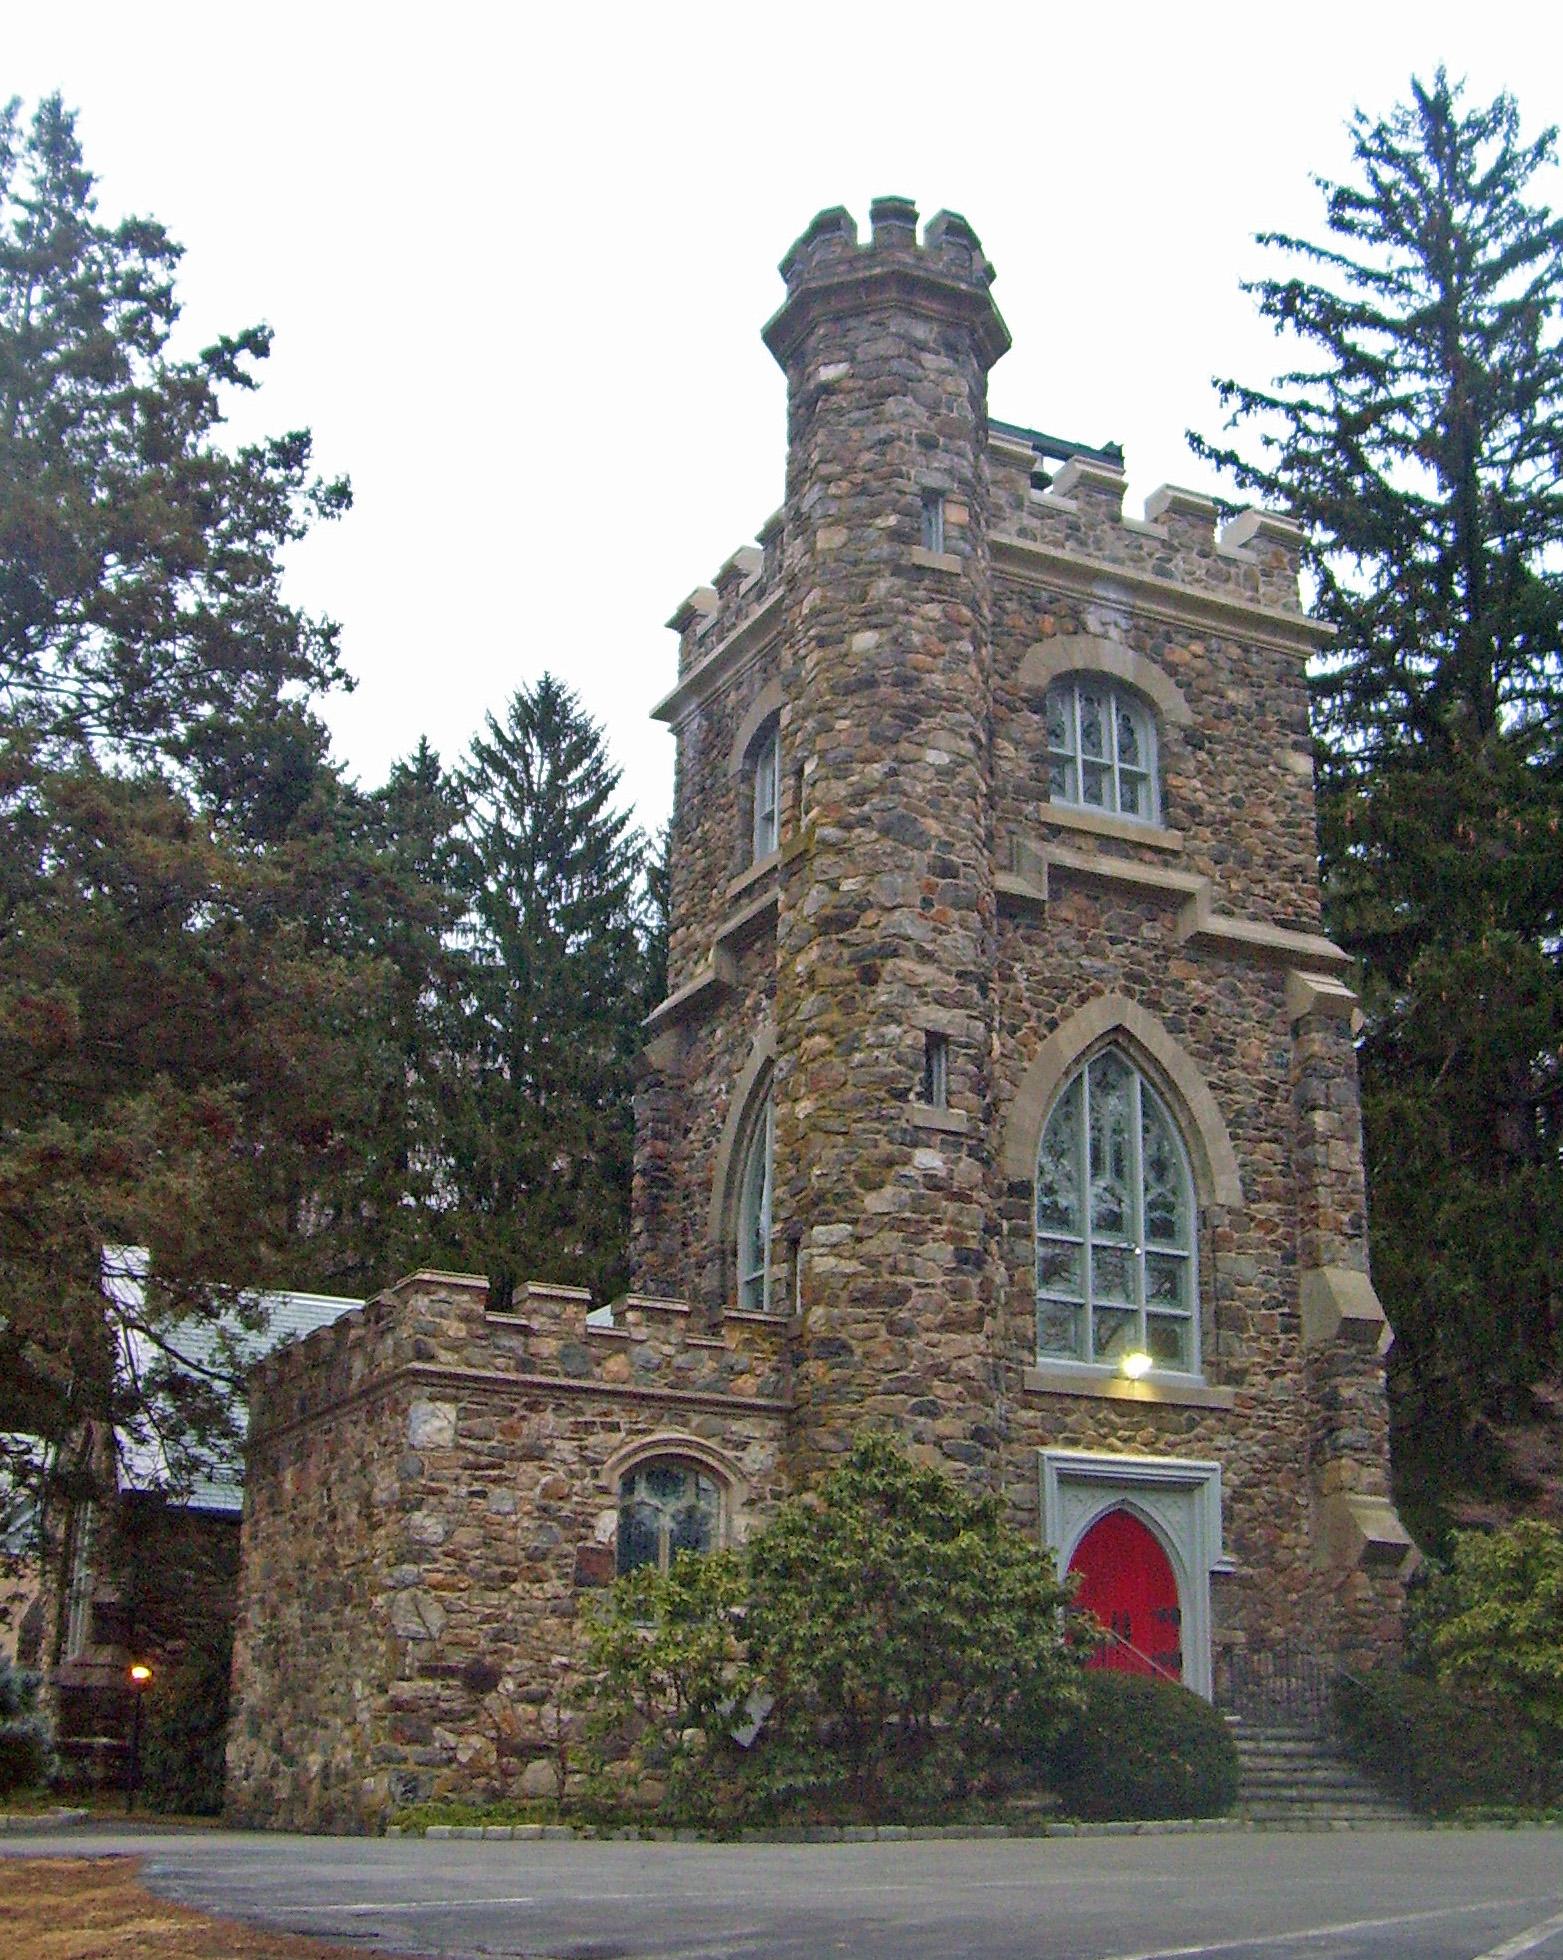 Church of The Virgin Mary, Chappaqua, New York